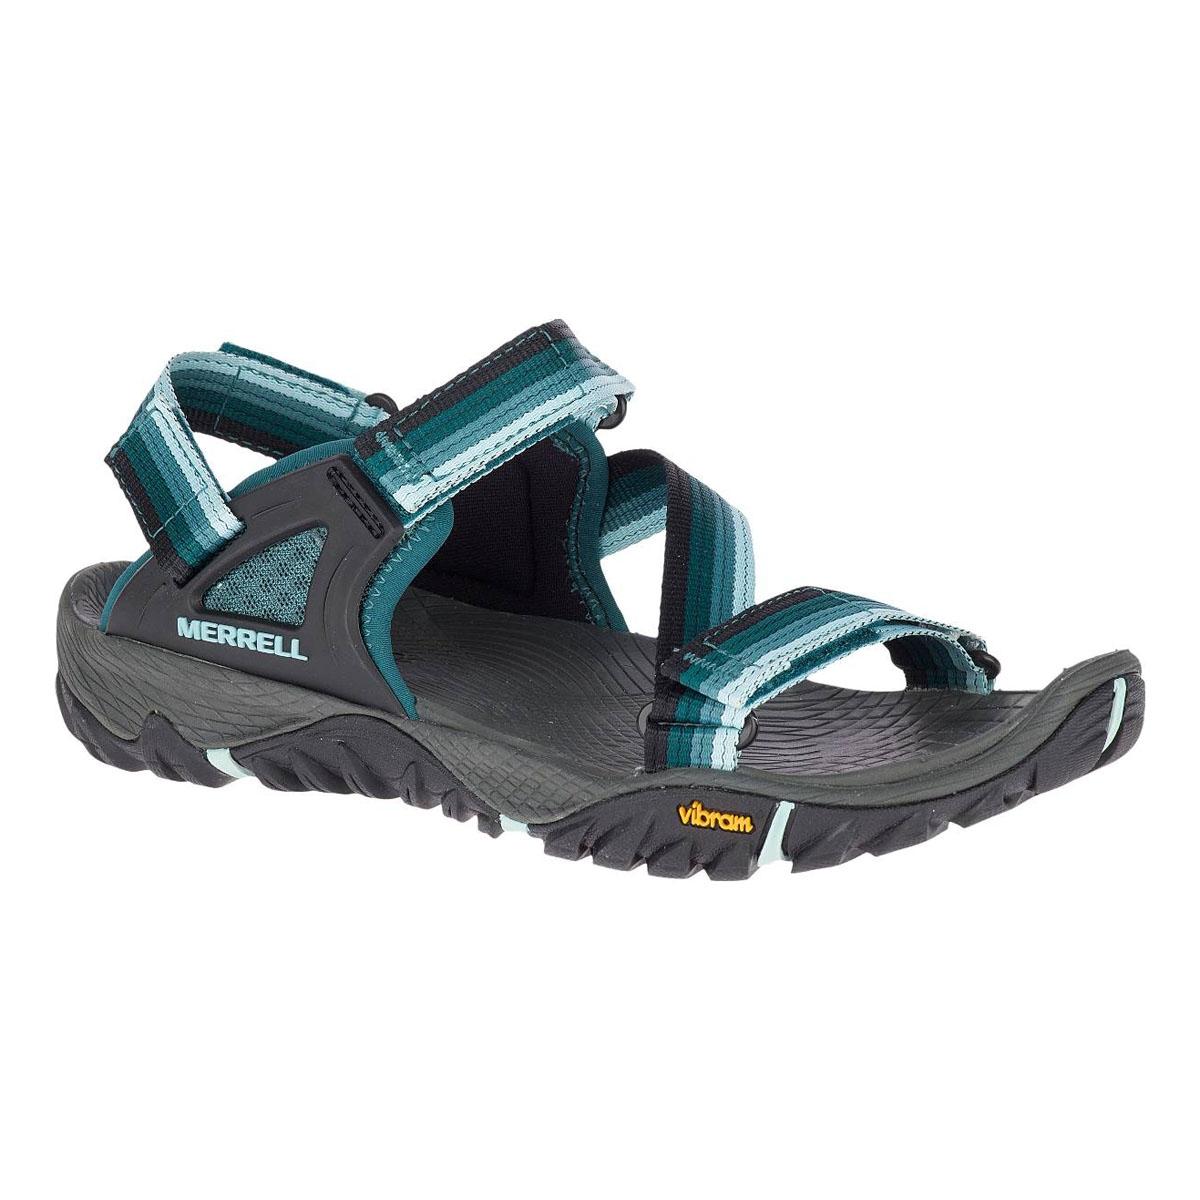 b2ec0774b540 Image of Merrell All Out Blaze Web Sandals (Women s) - Sea Pine